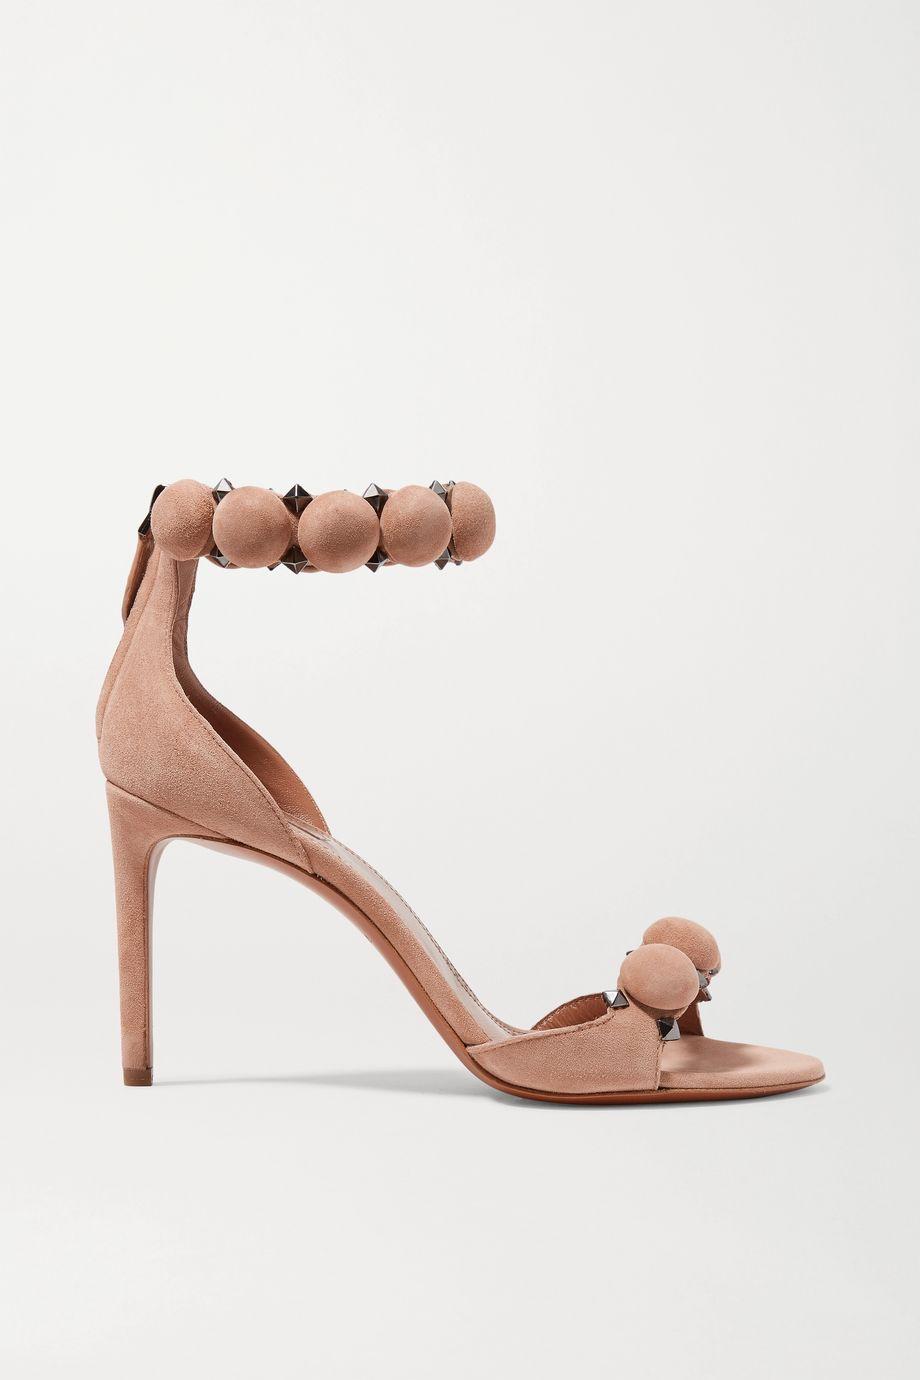 Alaïa Bombe 90 铆钉绒面革凉鞋